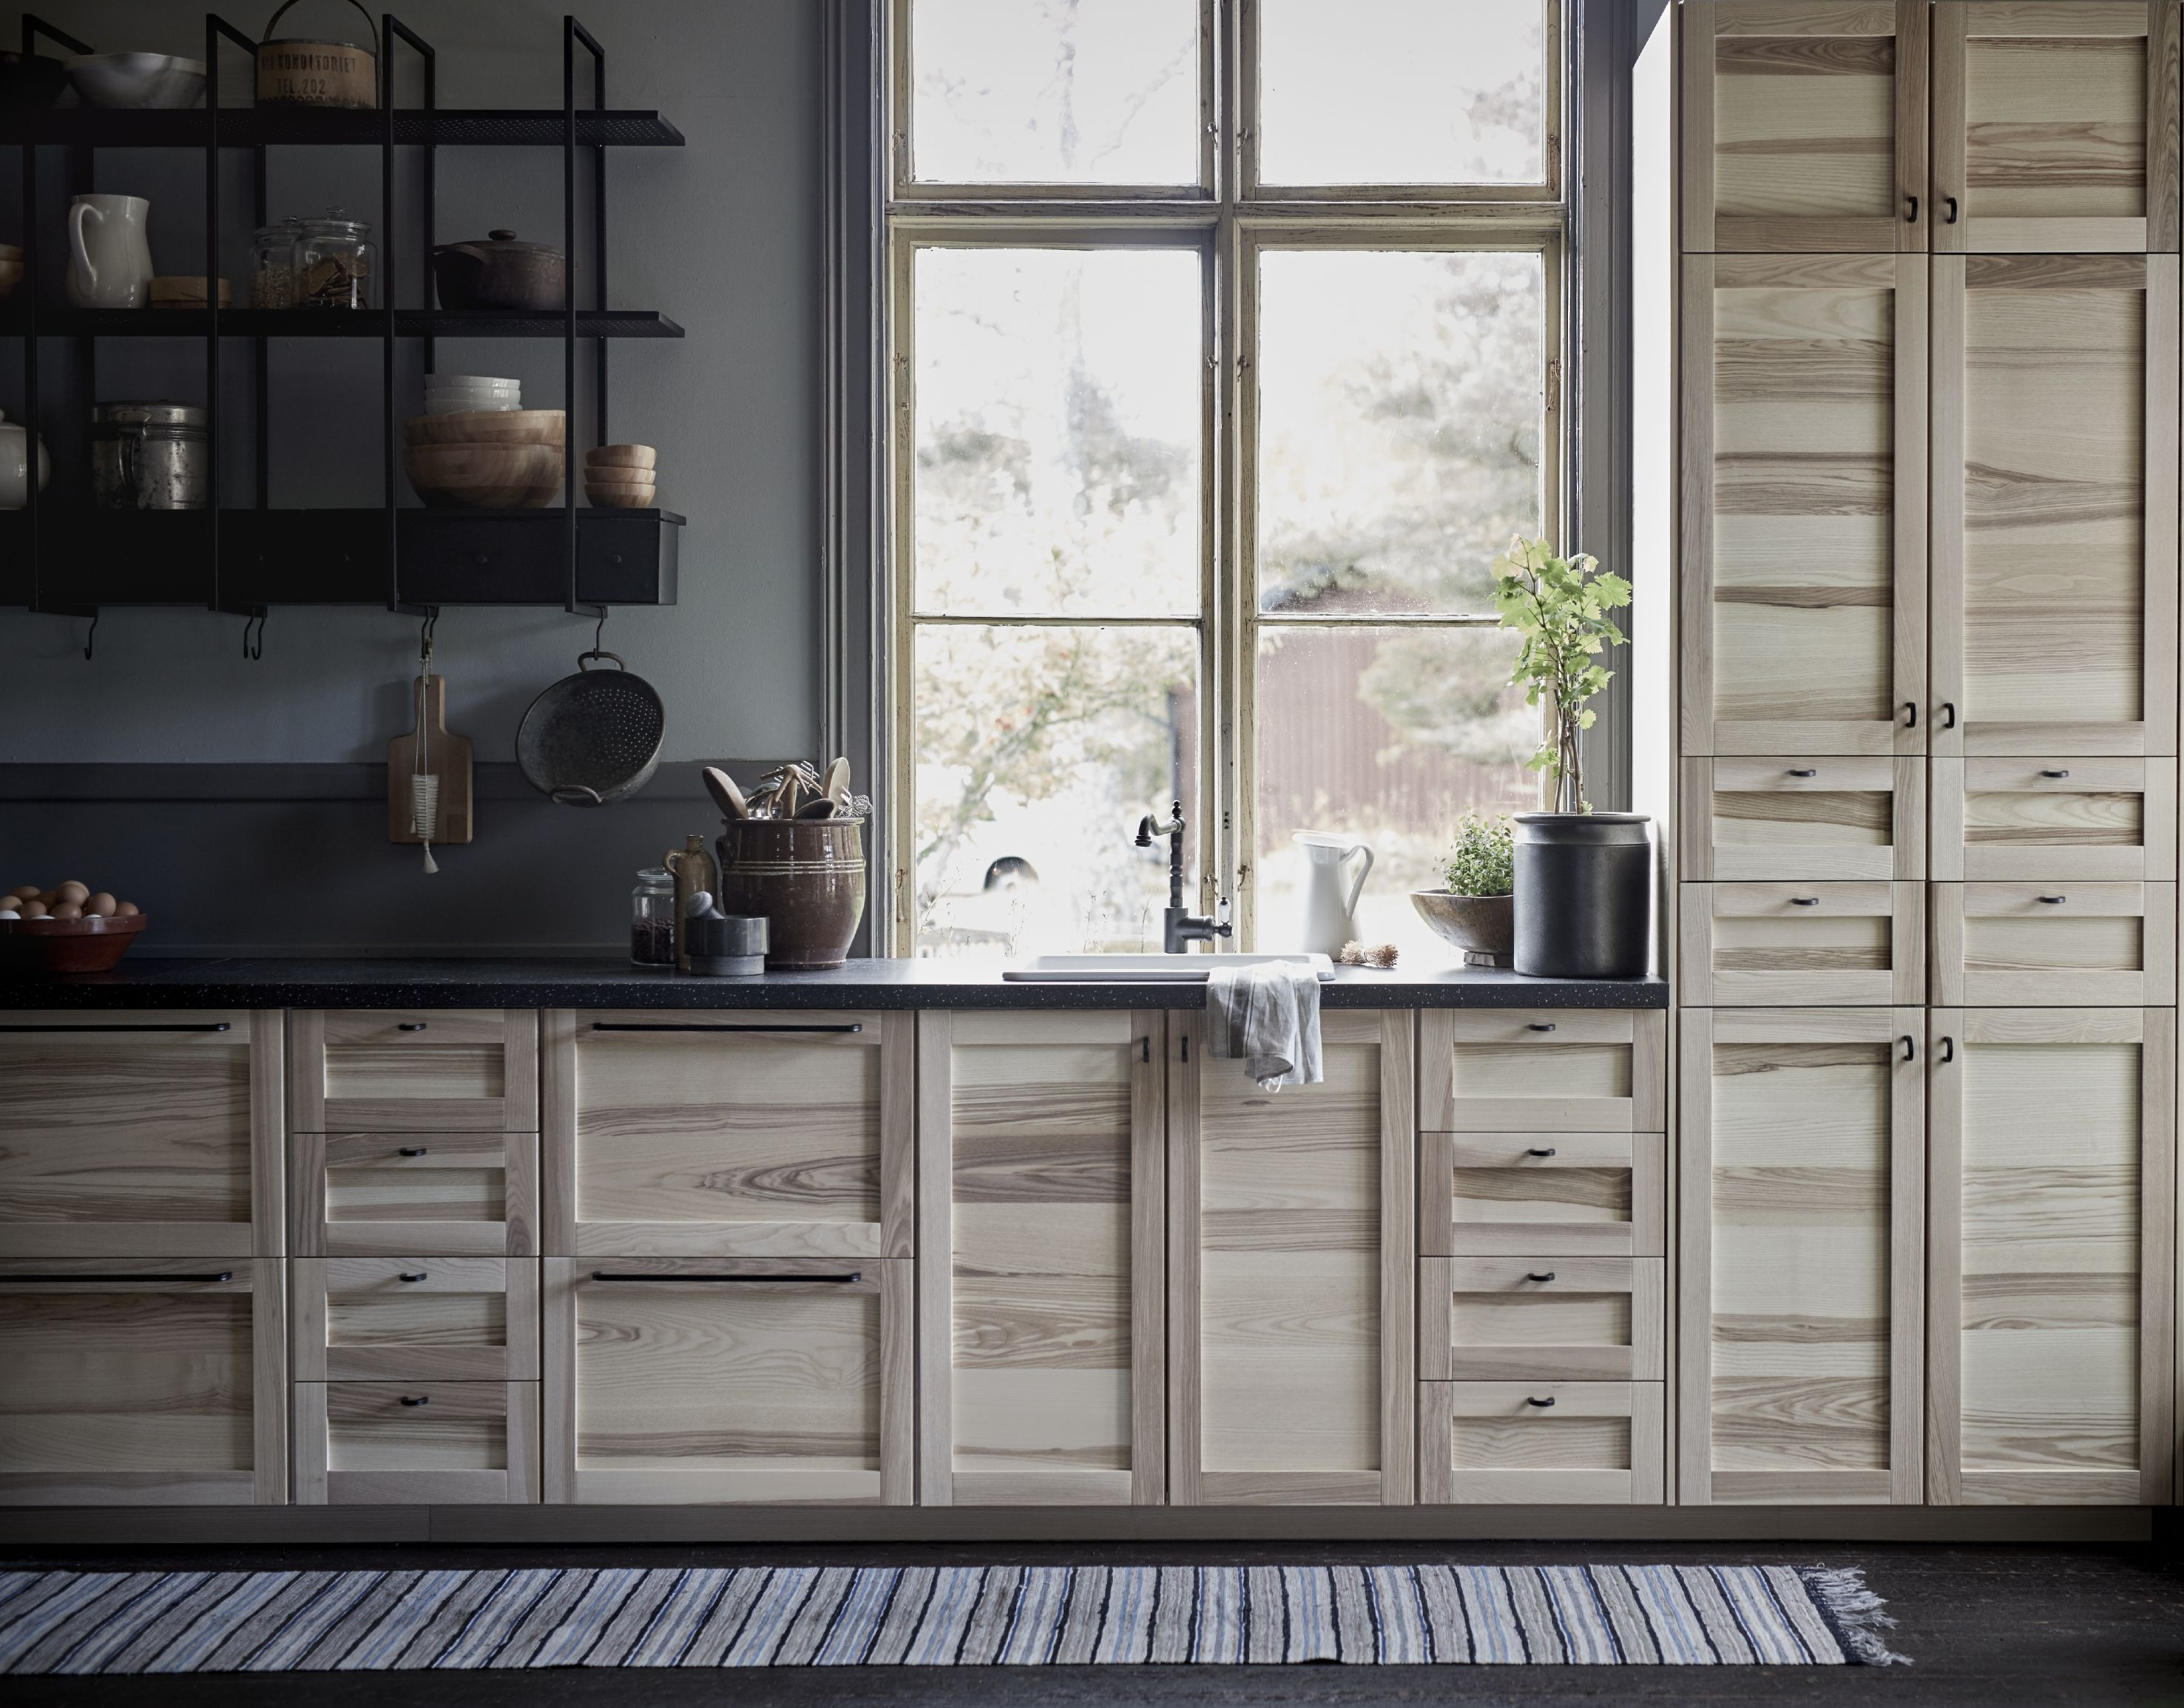 TORHAMN kitchen Ikea | kitchen | Pinterest | Cucina ikea, Ikea e Cucina